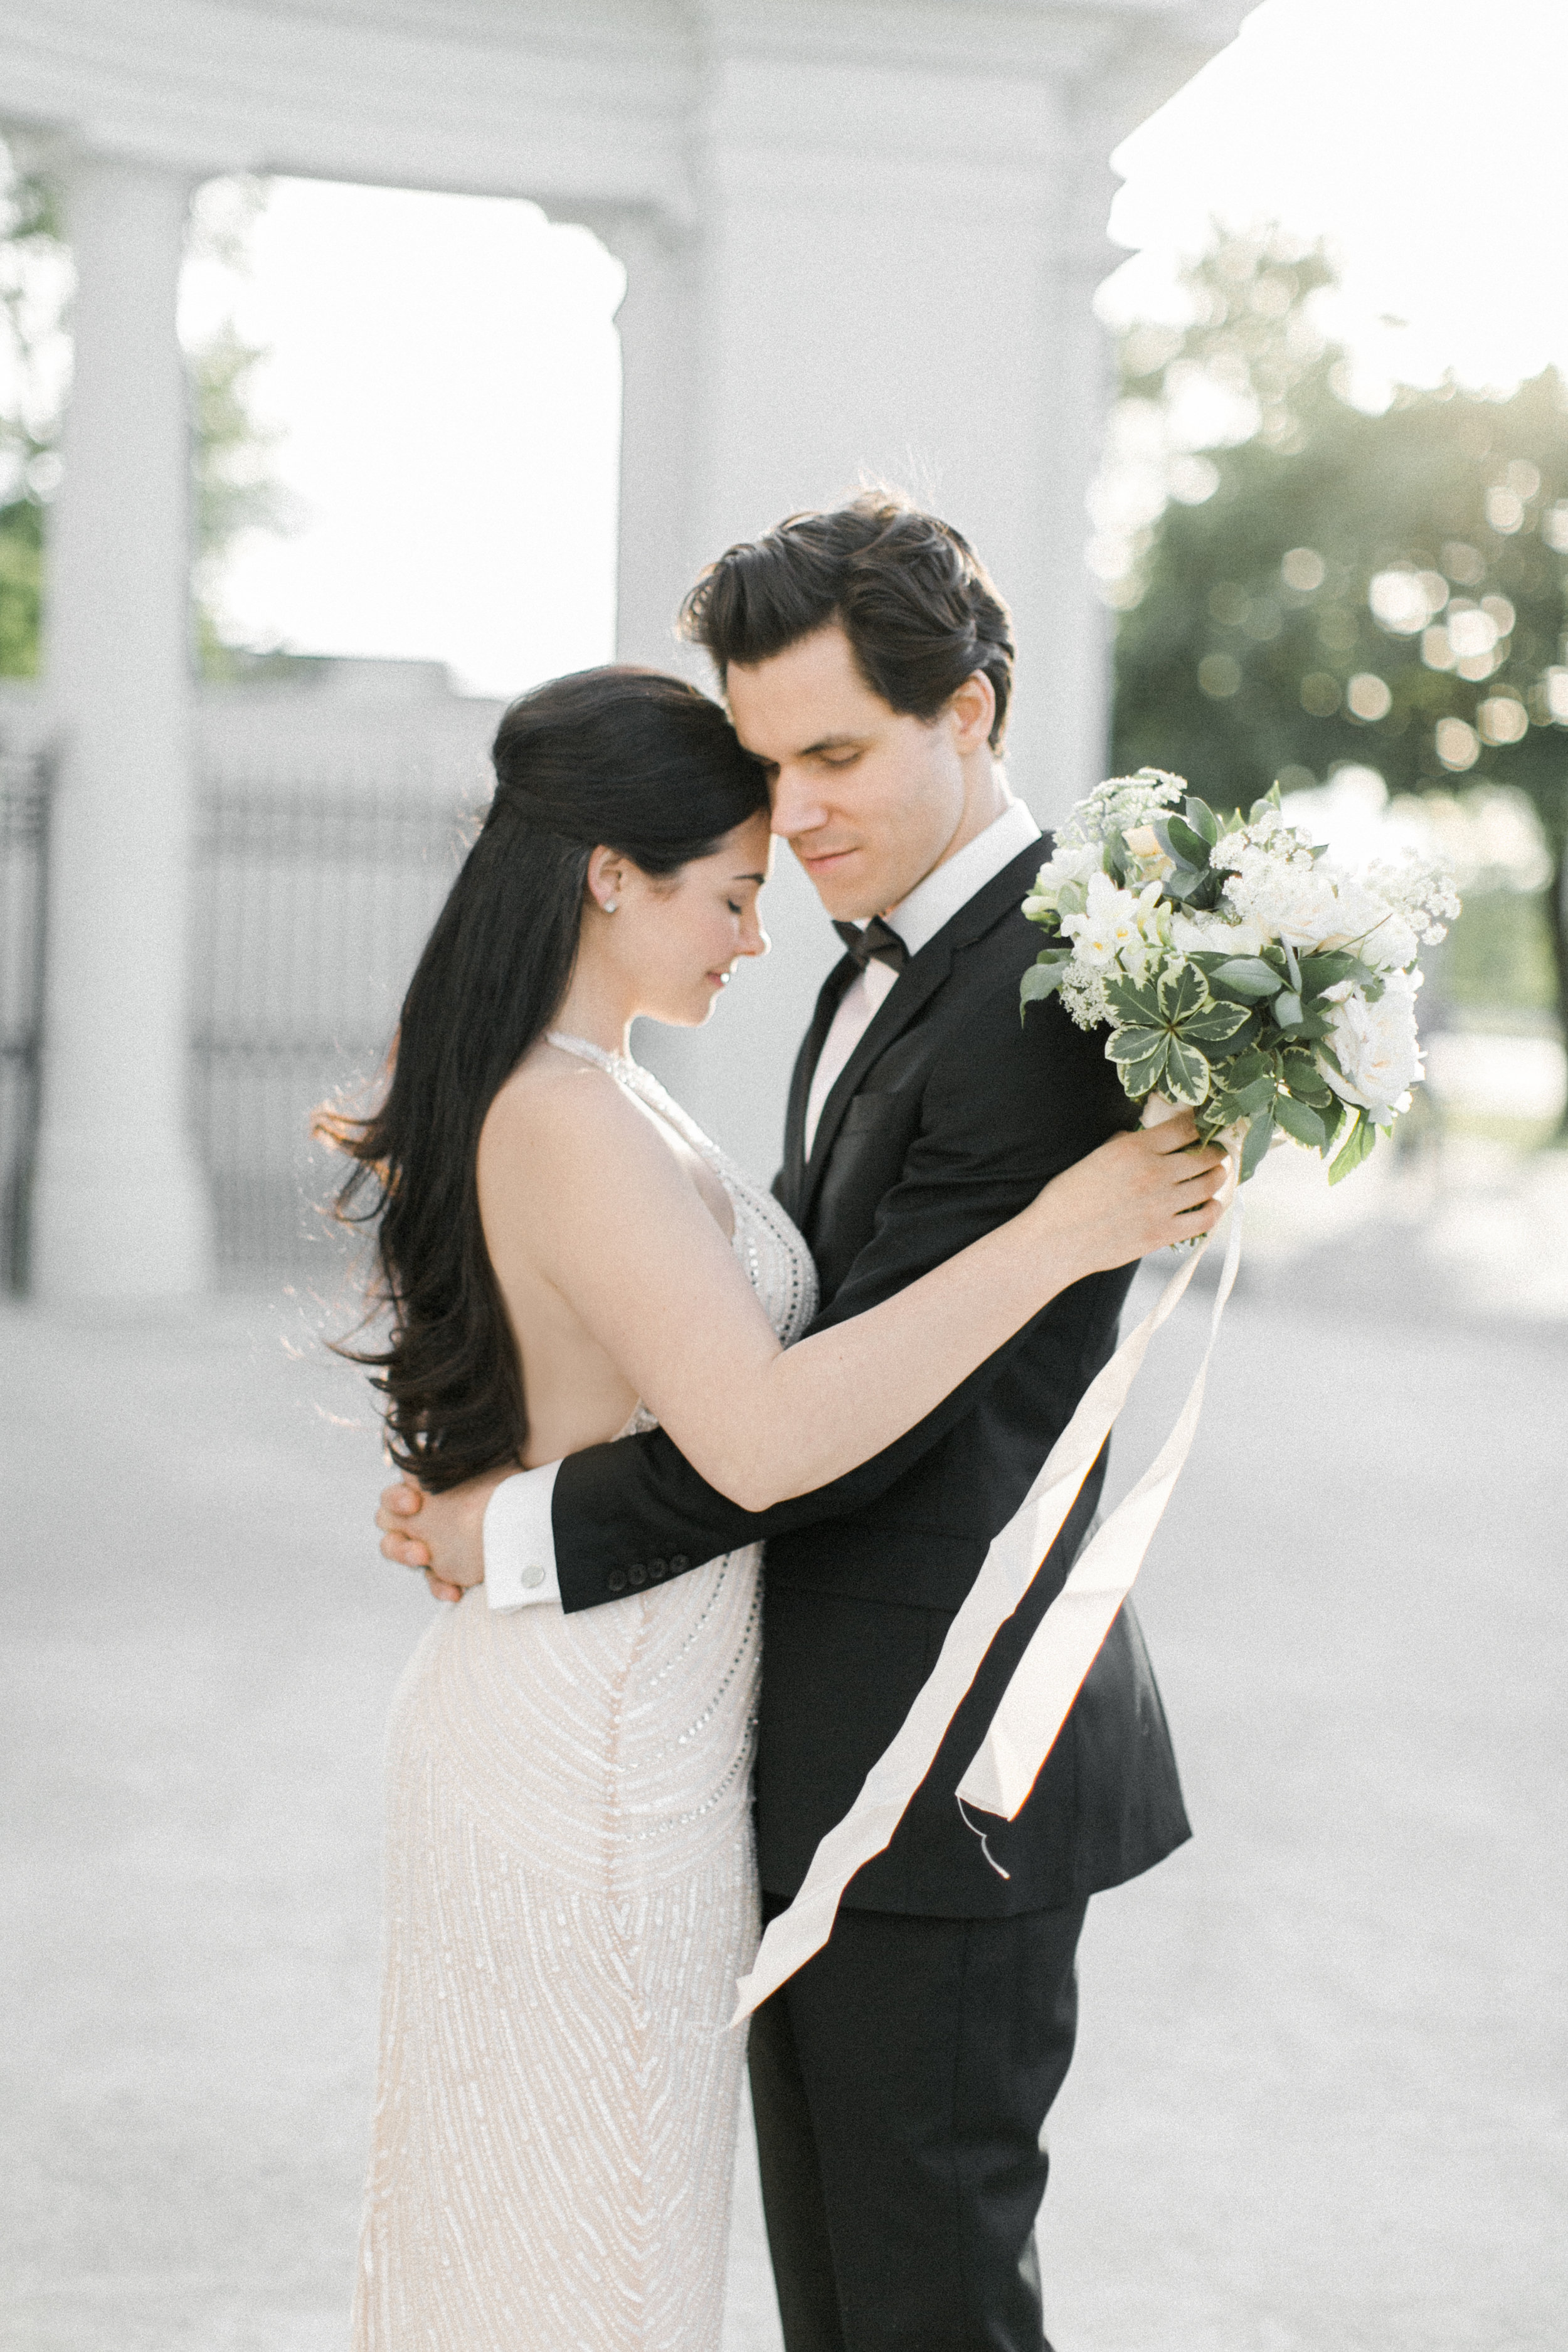 graydon-hall-toronto-ontario-high-end-wedding-photographer-richelle-hunter-bryce-hunter-sarah-hunter-anniversary-32.jpg